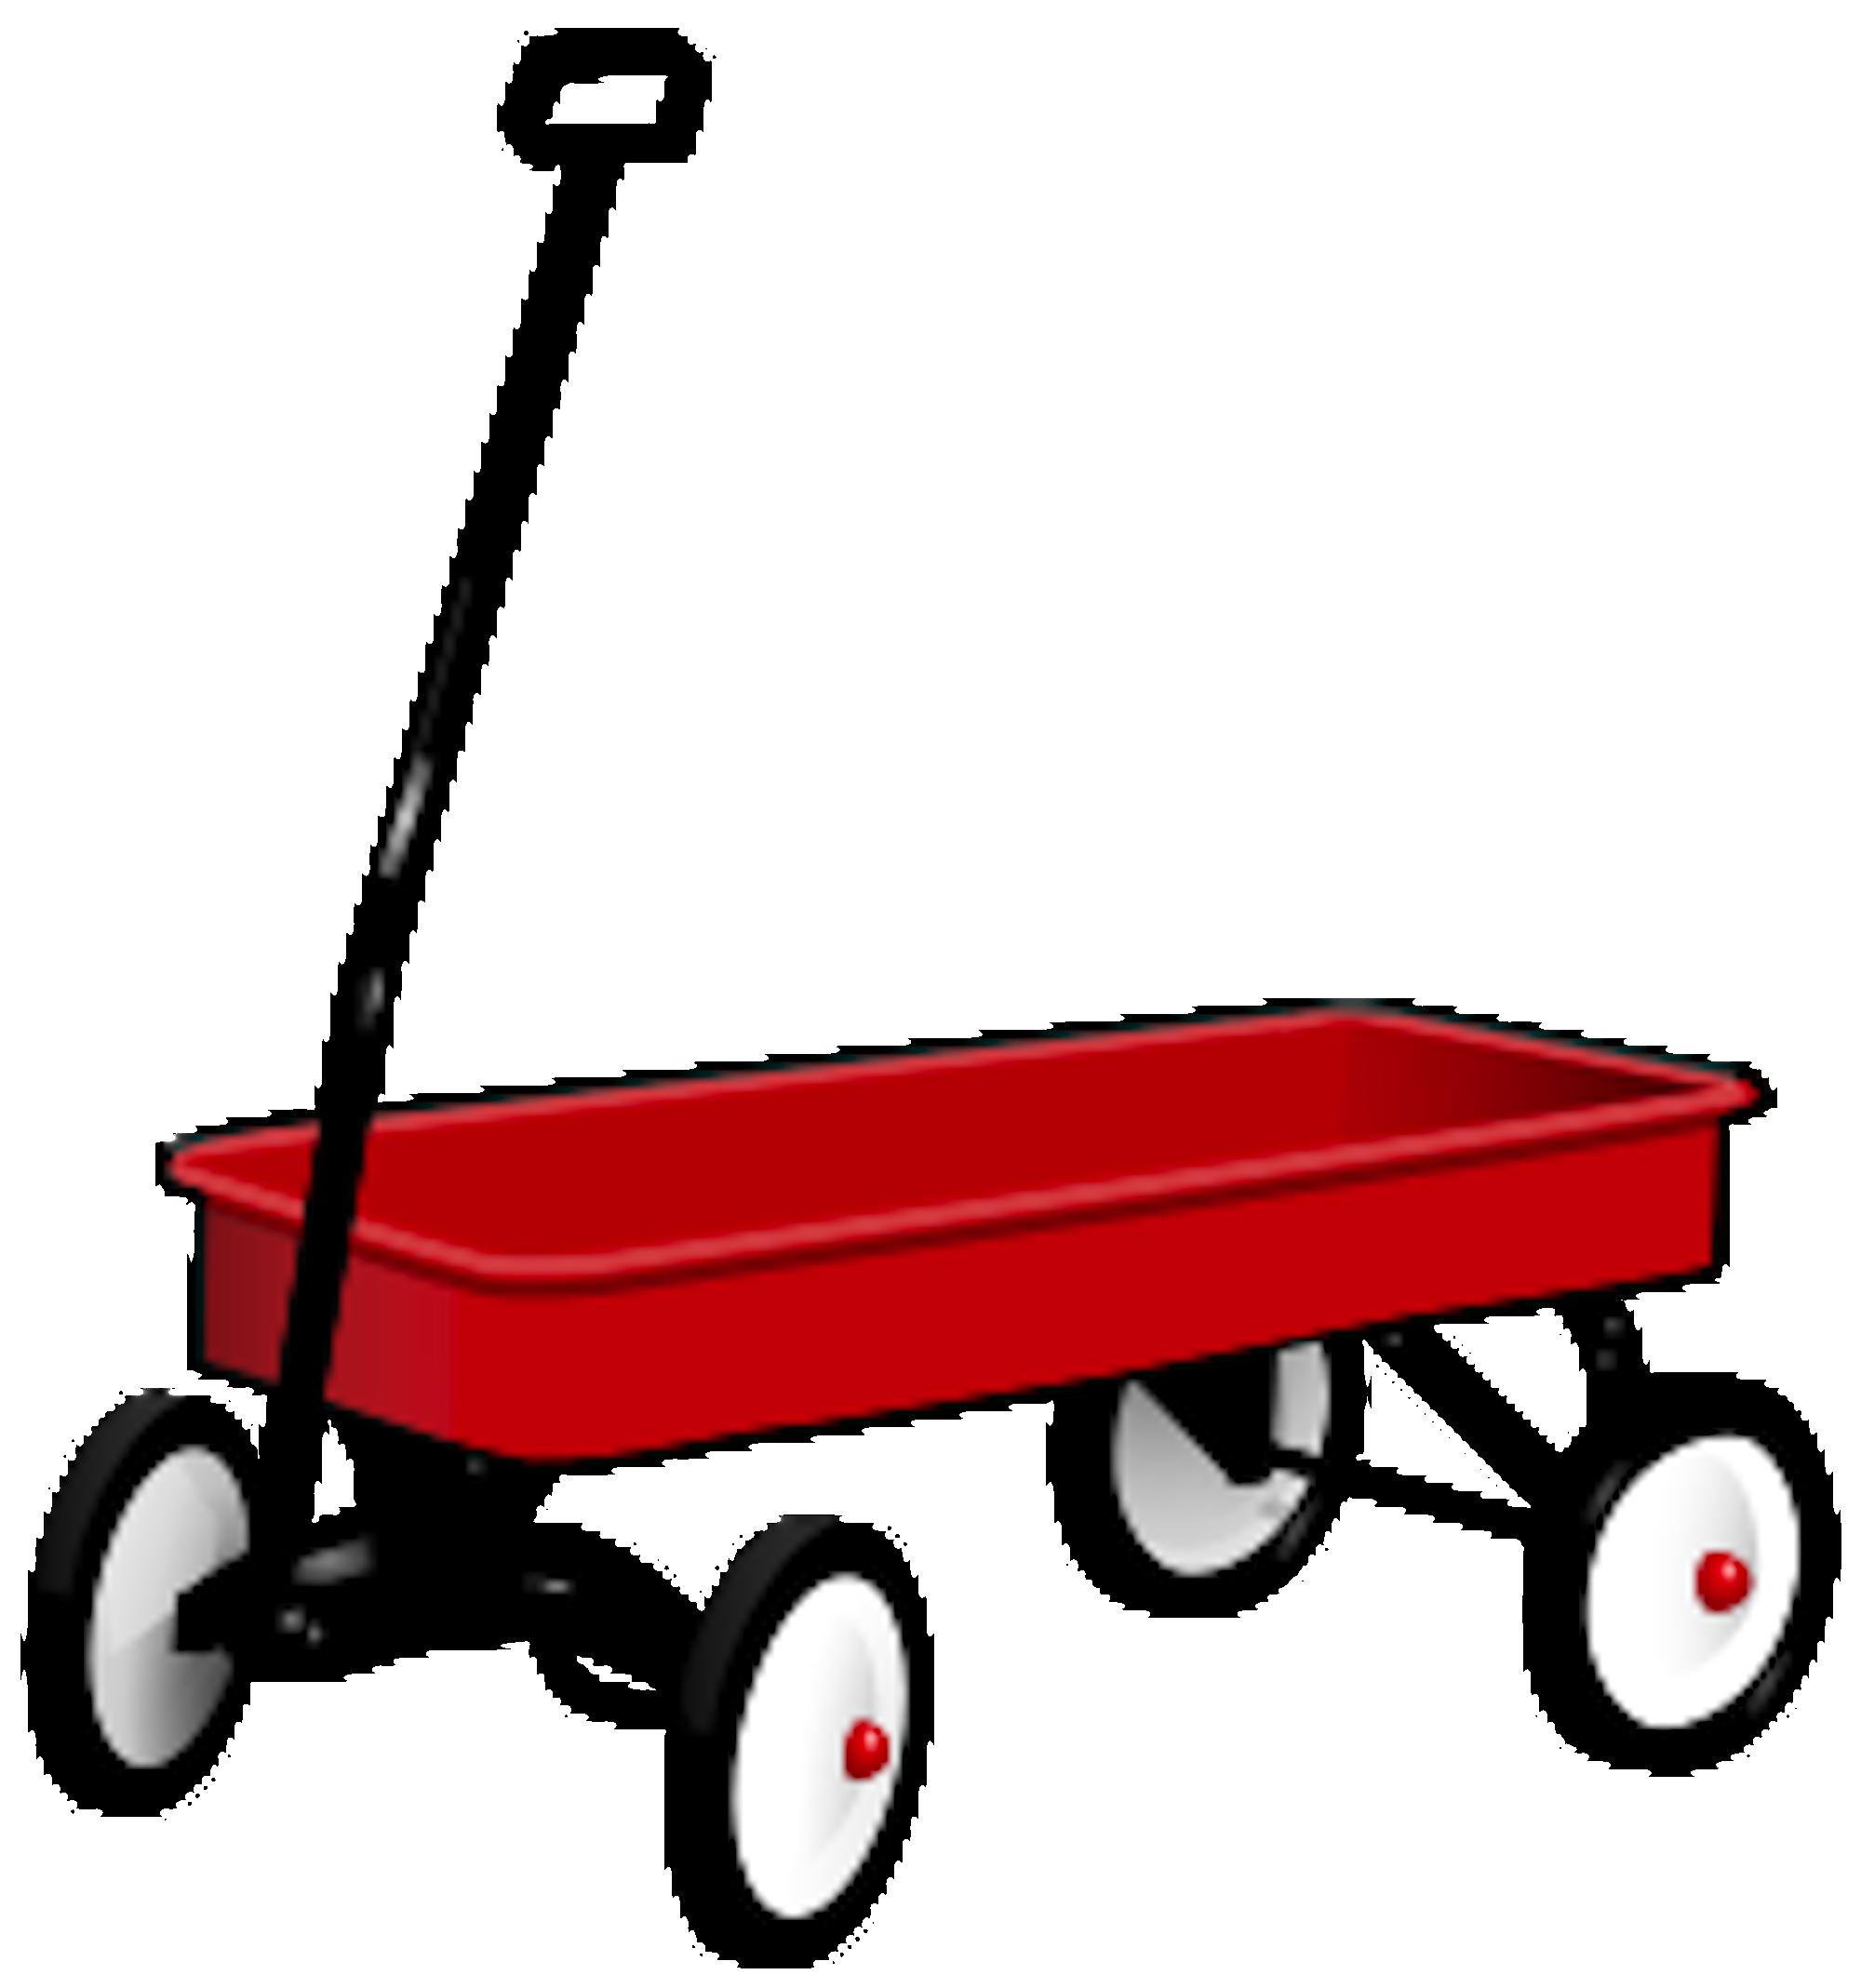 Http pluspng com png. Pioneer clipart bullock cart